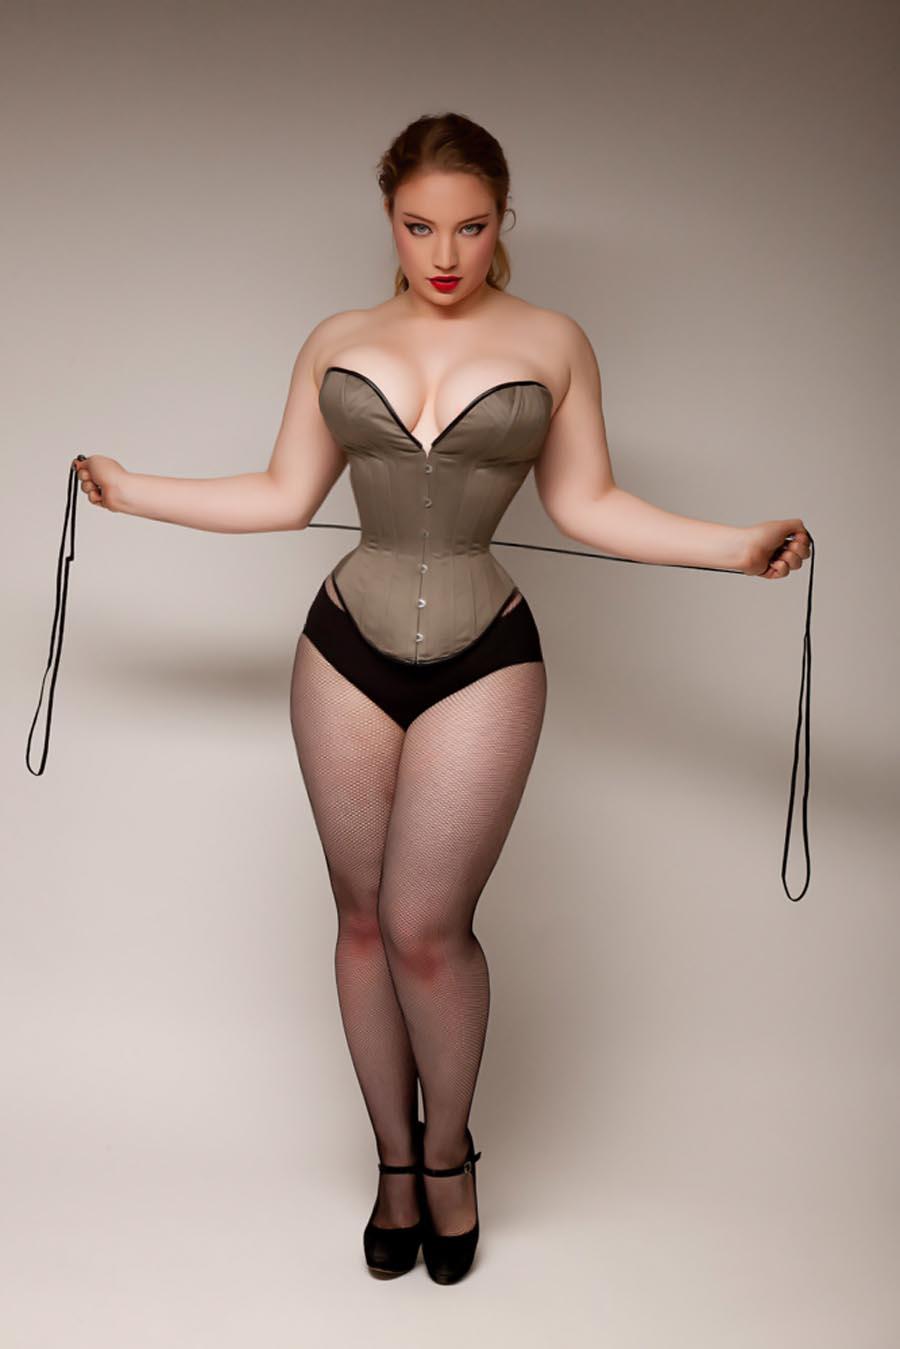 Эротика толстушки в корсете 5 фотография